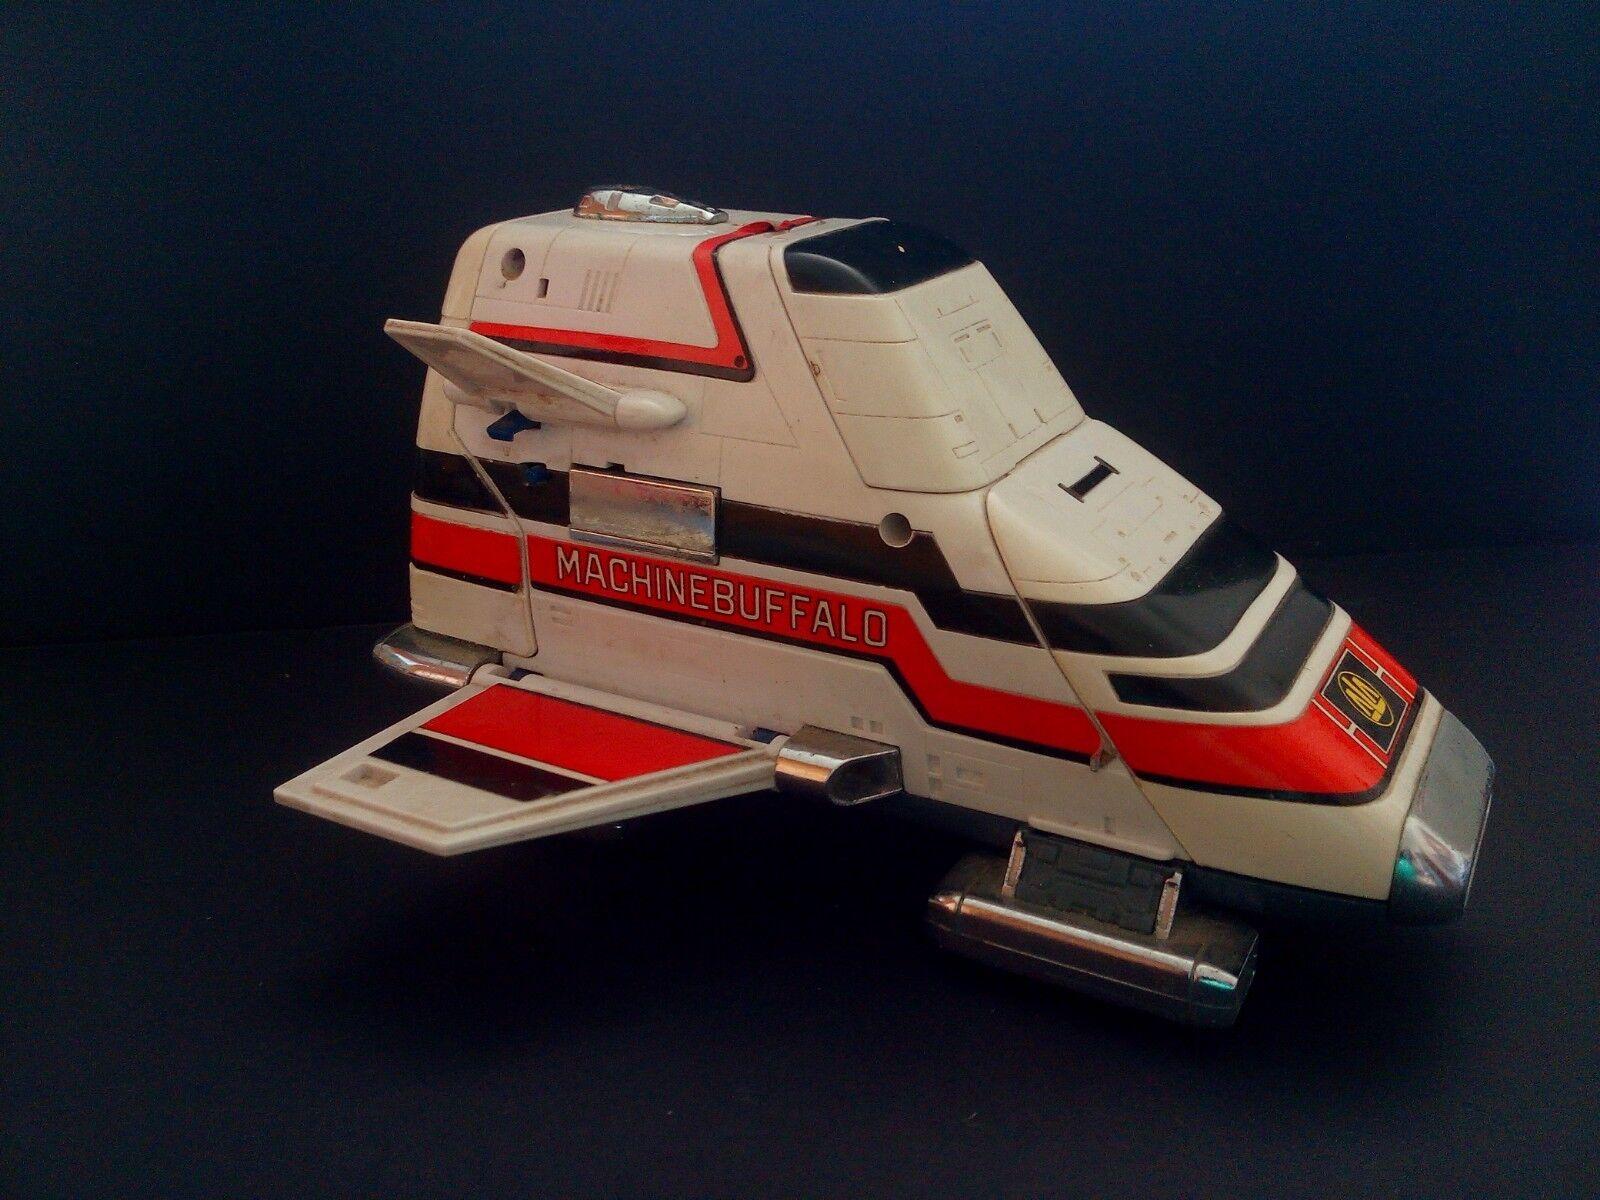 1988 Bandai Choujuu Sentai Liveman máquina Buffalo serie dx Popynica